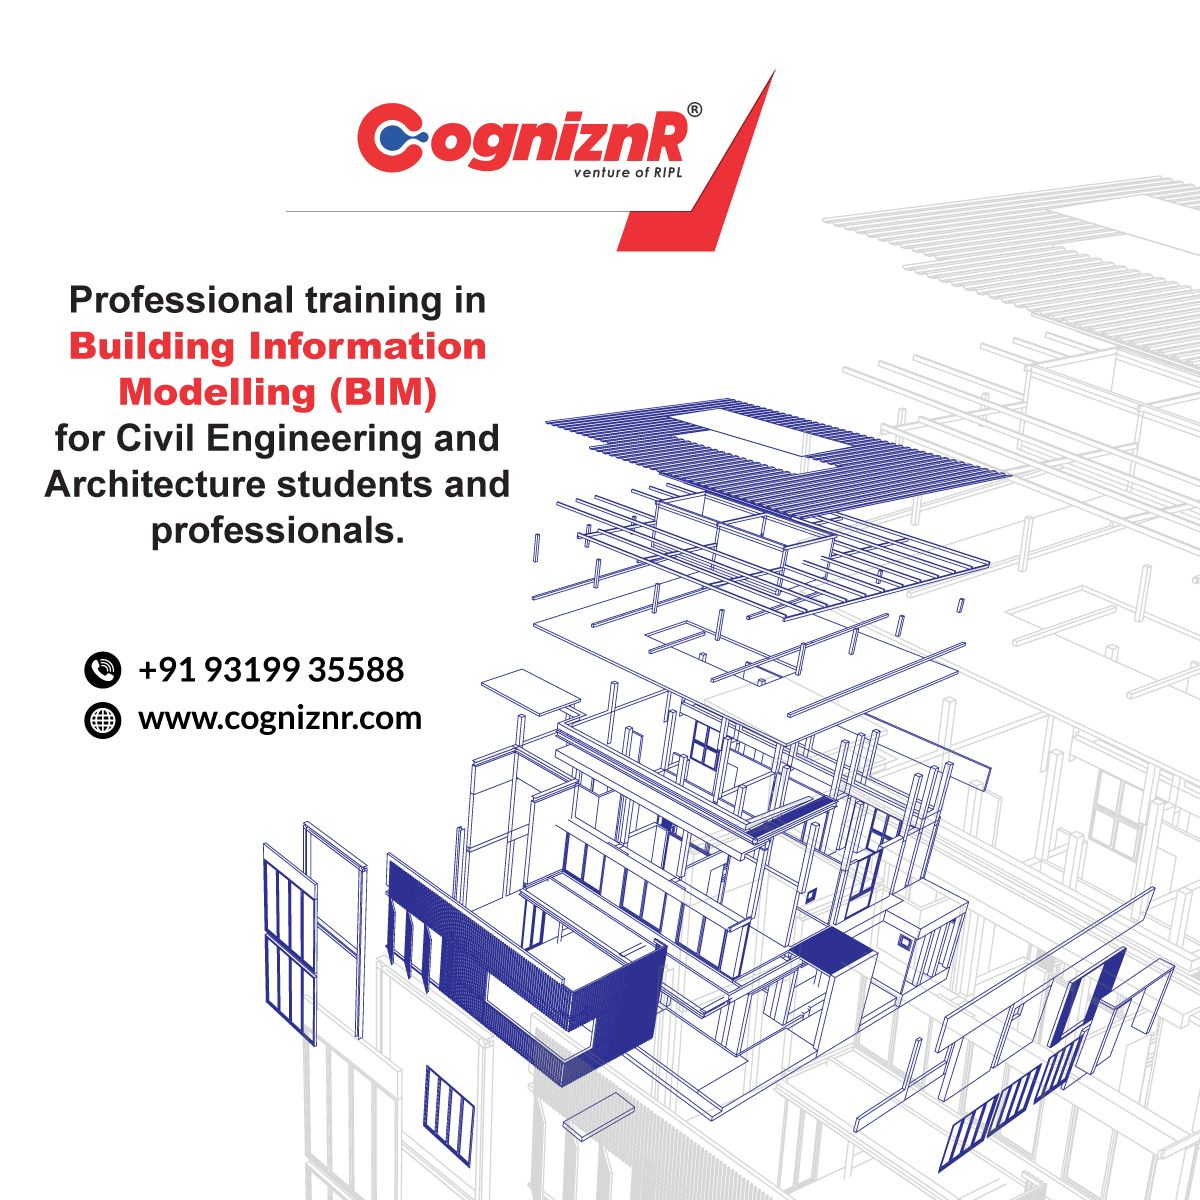 Address 59 15 3rd Floor Satyam House Guru Ravi Das Marg Kalkaji New Delhi 110019 Fo Building Information Modeling Civil Engineering Architecture Student